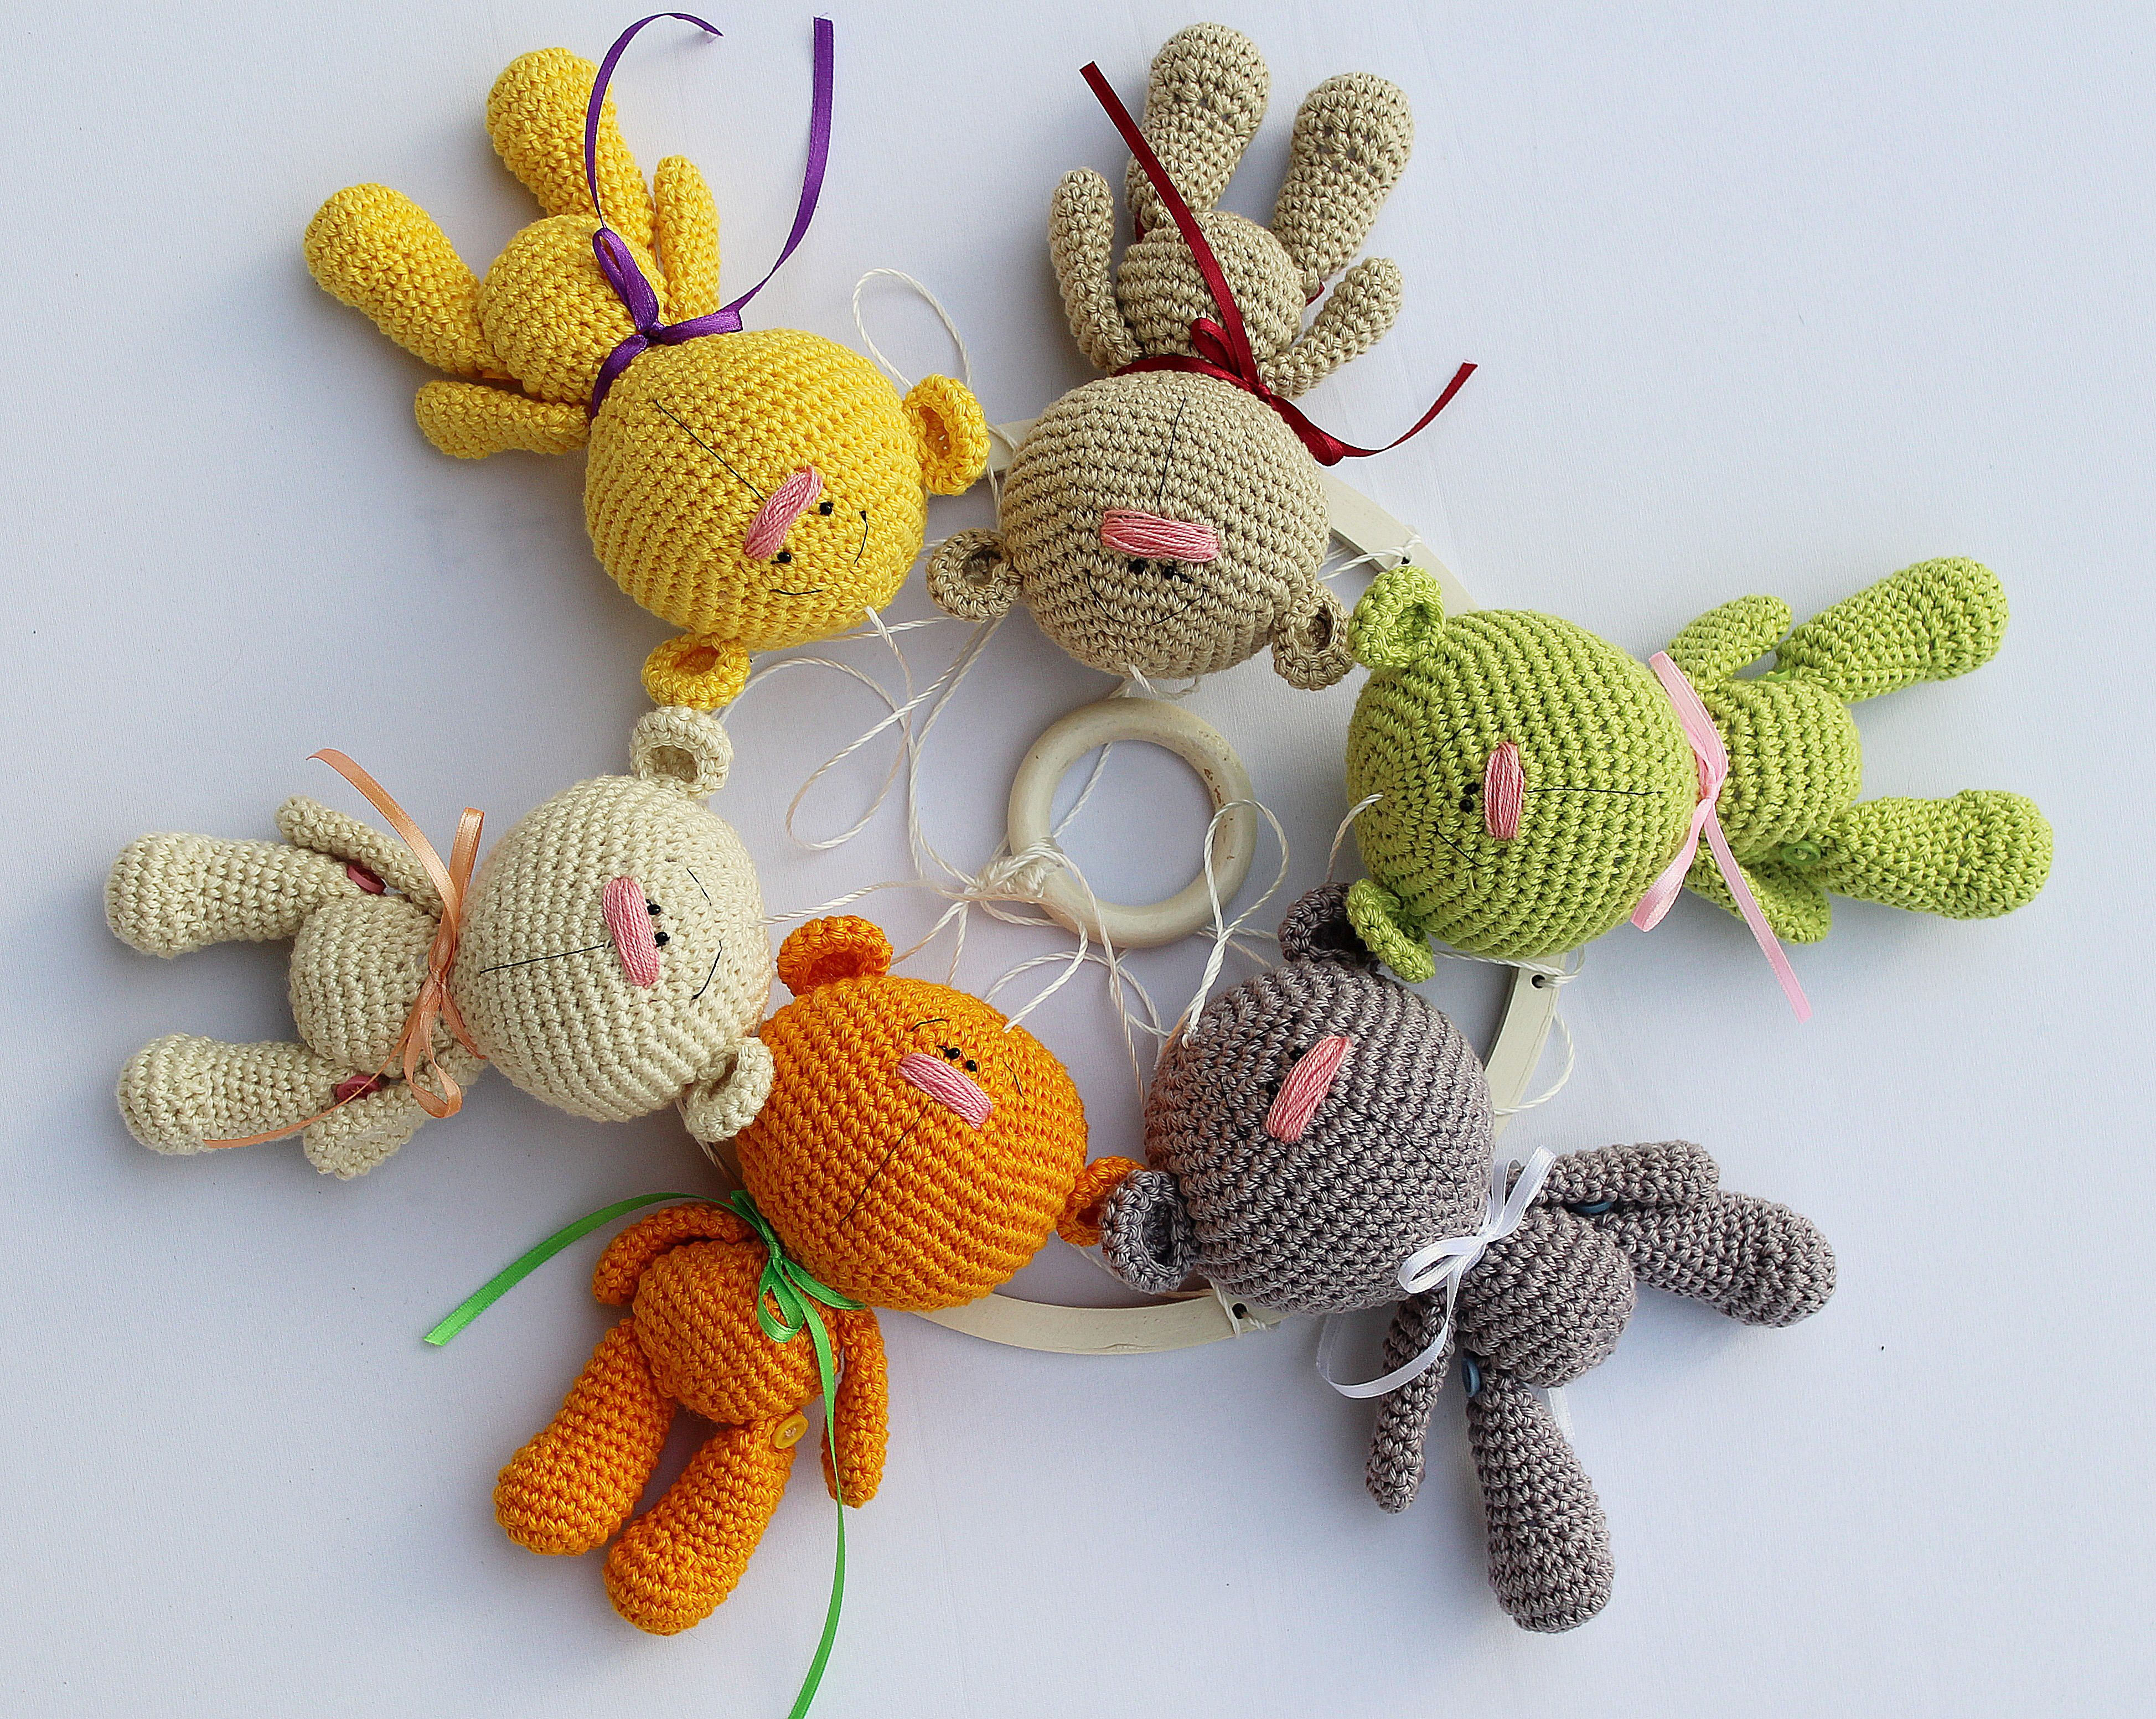 Amigurumi Lady Teddy Bear FREE PATTERN – Amigurumi Free Patterns ... | 3106x3895